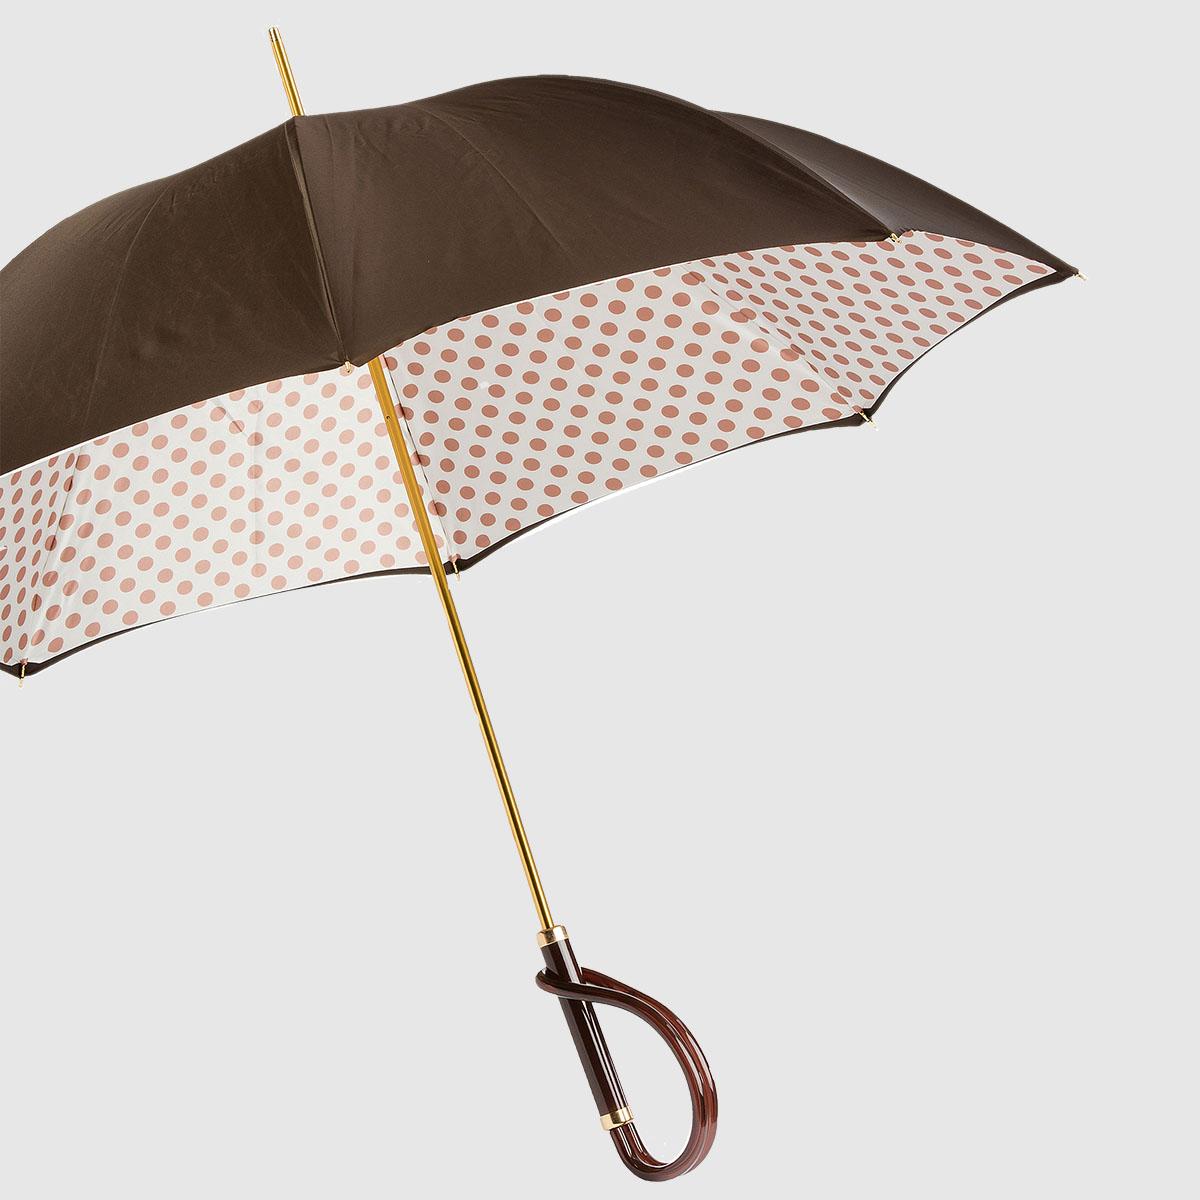 Women's Umbrella with polka dot lining